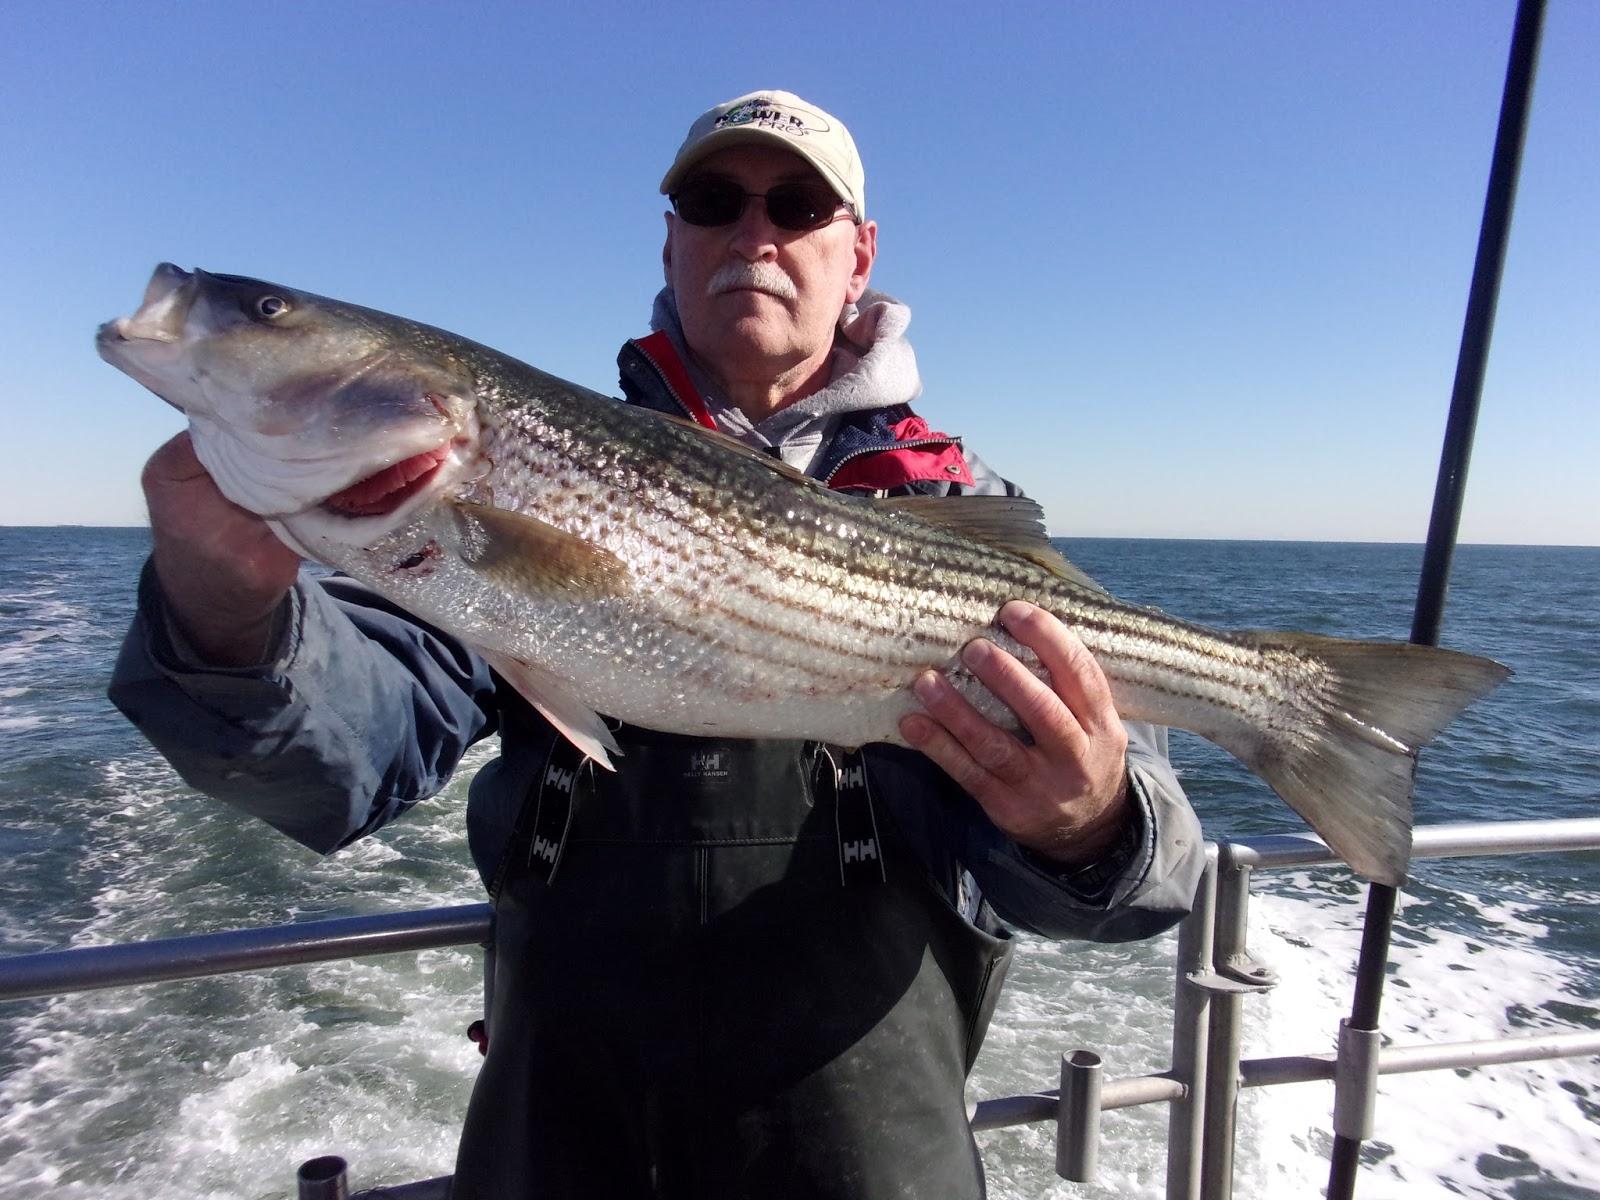 Nj salt fish 2016 10 31 seahunter atlantic highlands for Atlantic highlands fishing report